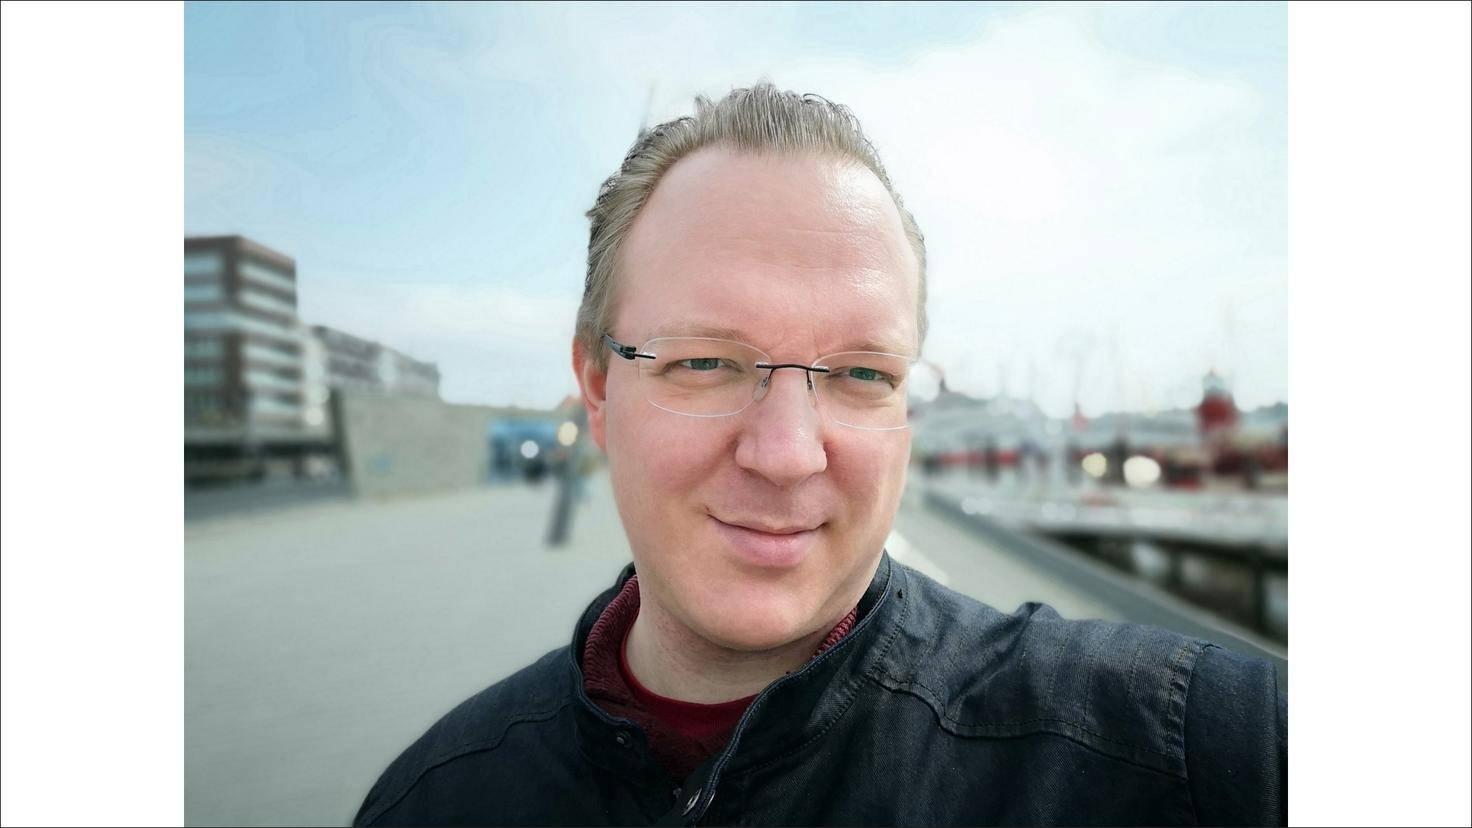 Huawei P20 Pro Andreas Müller Selfie 4